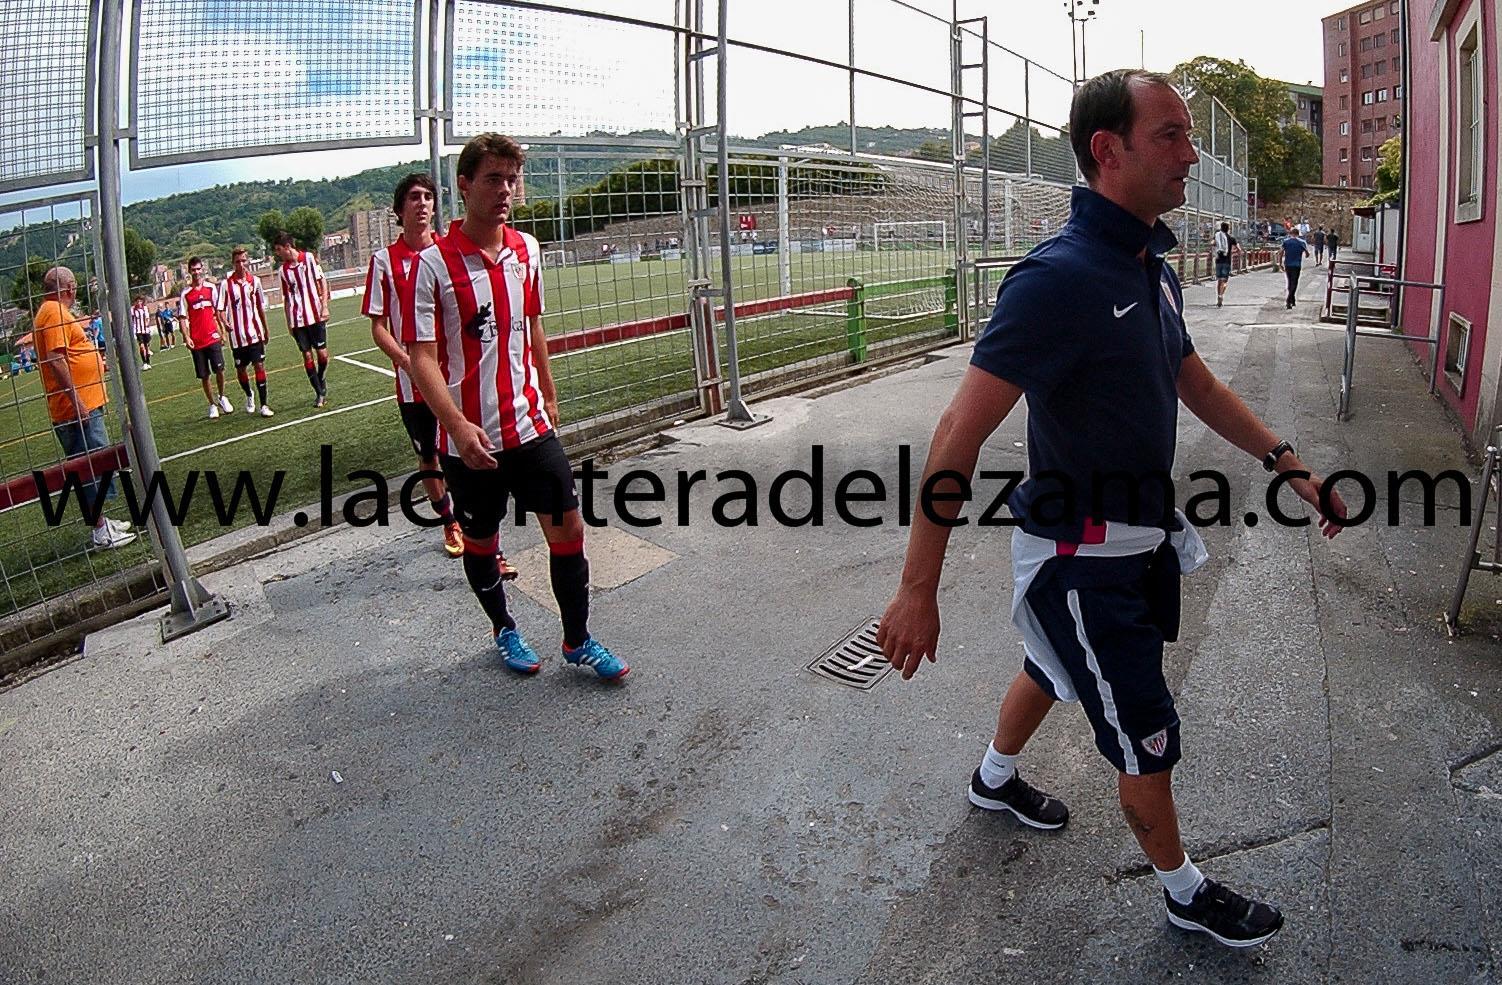 Etxebe encabeza el equipo durante un partido de pretemporada en Maiona | Foto: Unai Zabaleta